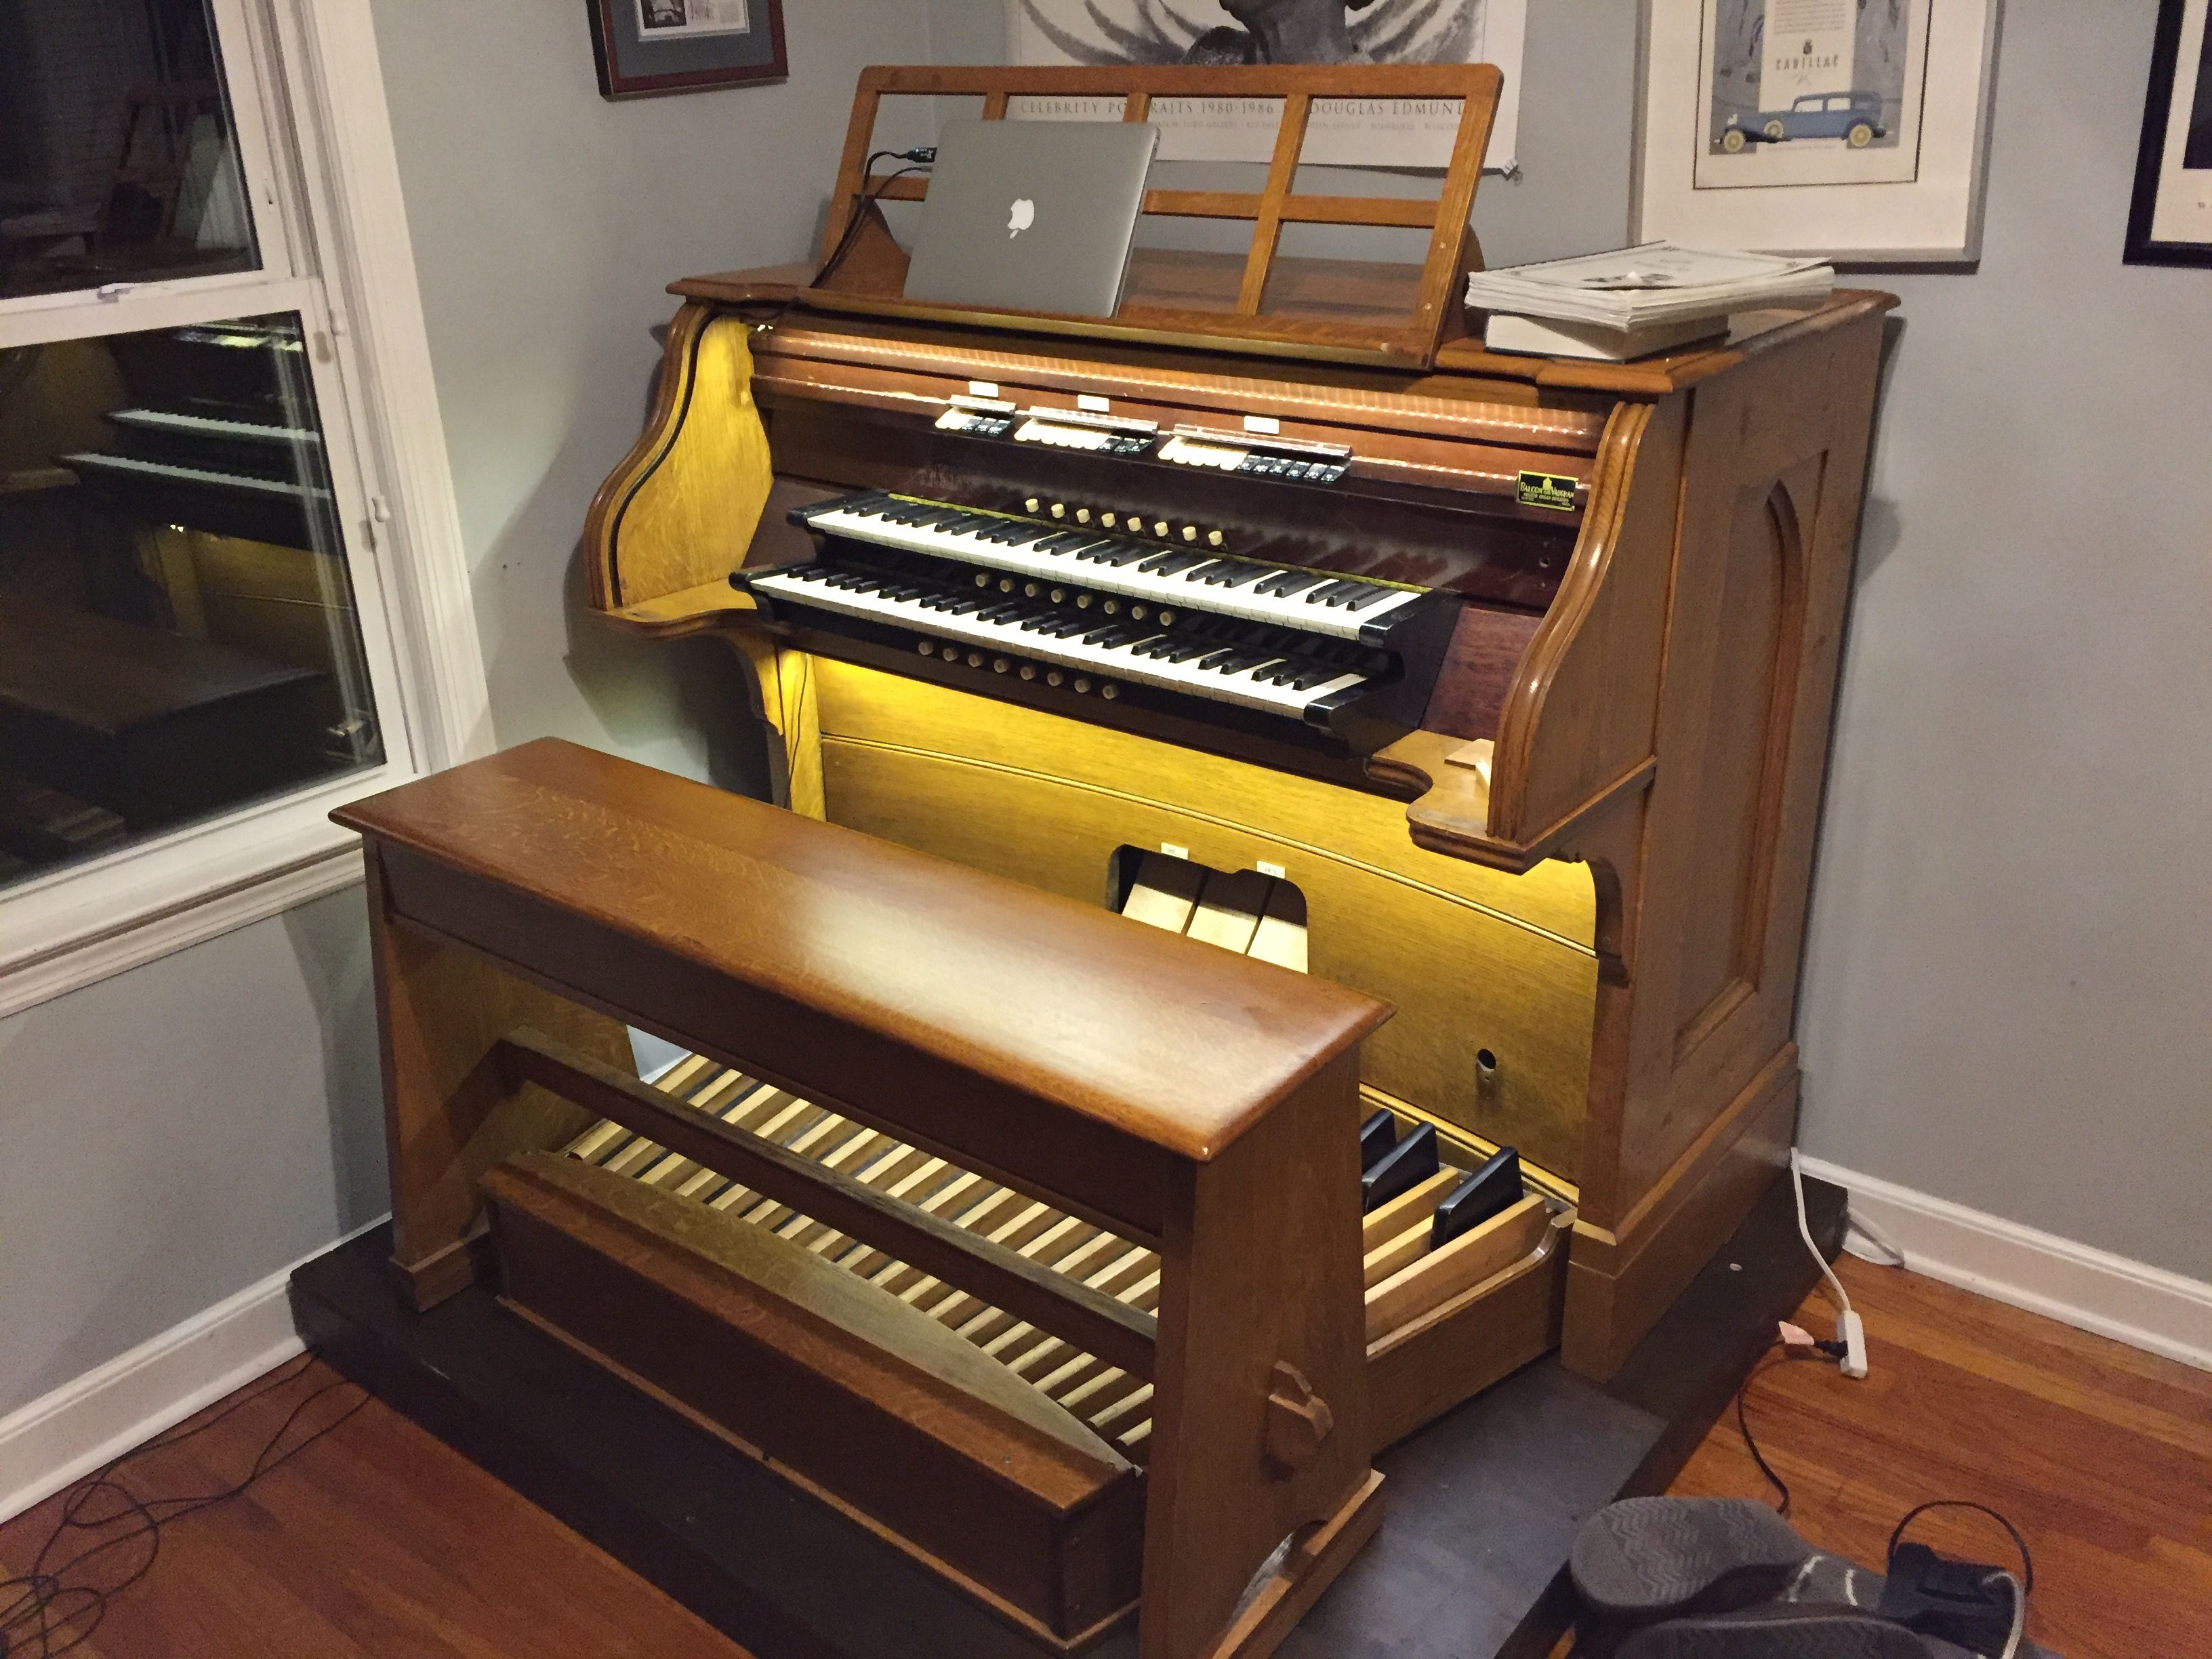 I restored a pipe organ console and converted it into a MIDI